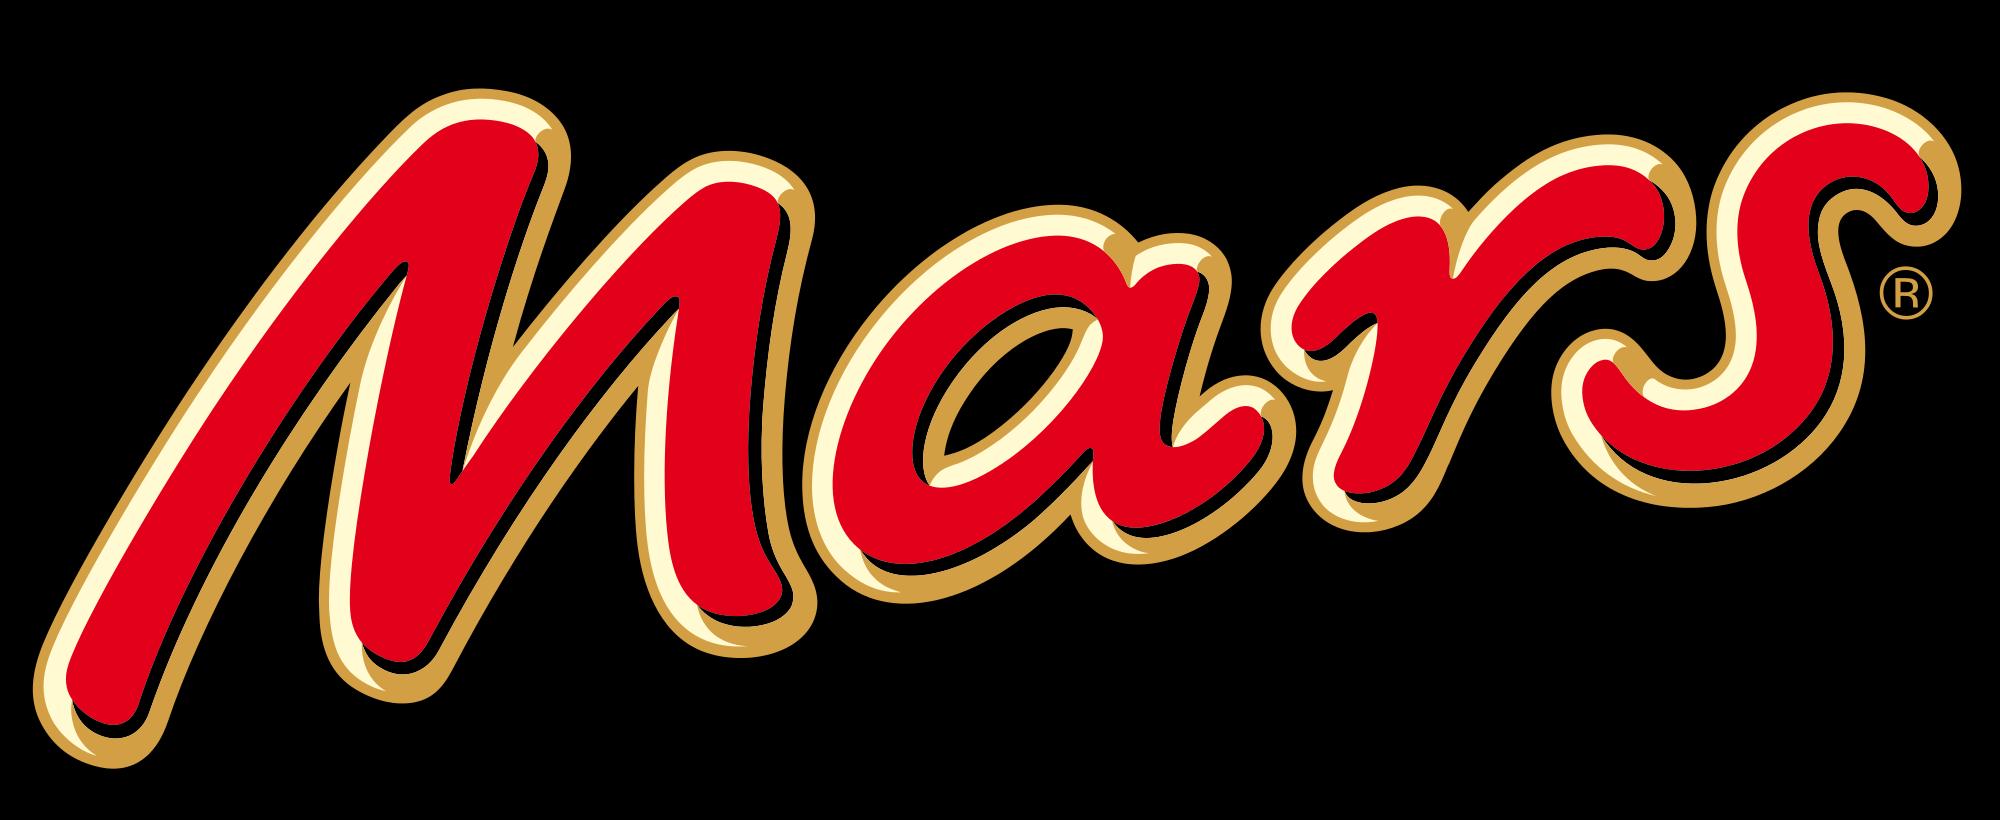 Mars Logo | Chocolate logo, Candy logo, Candy brands logo